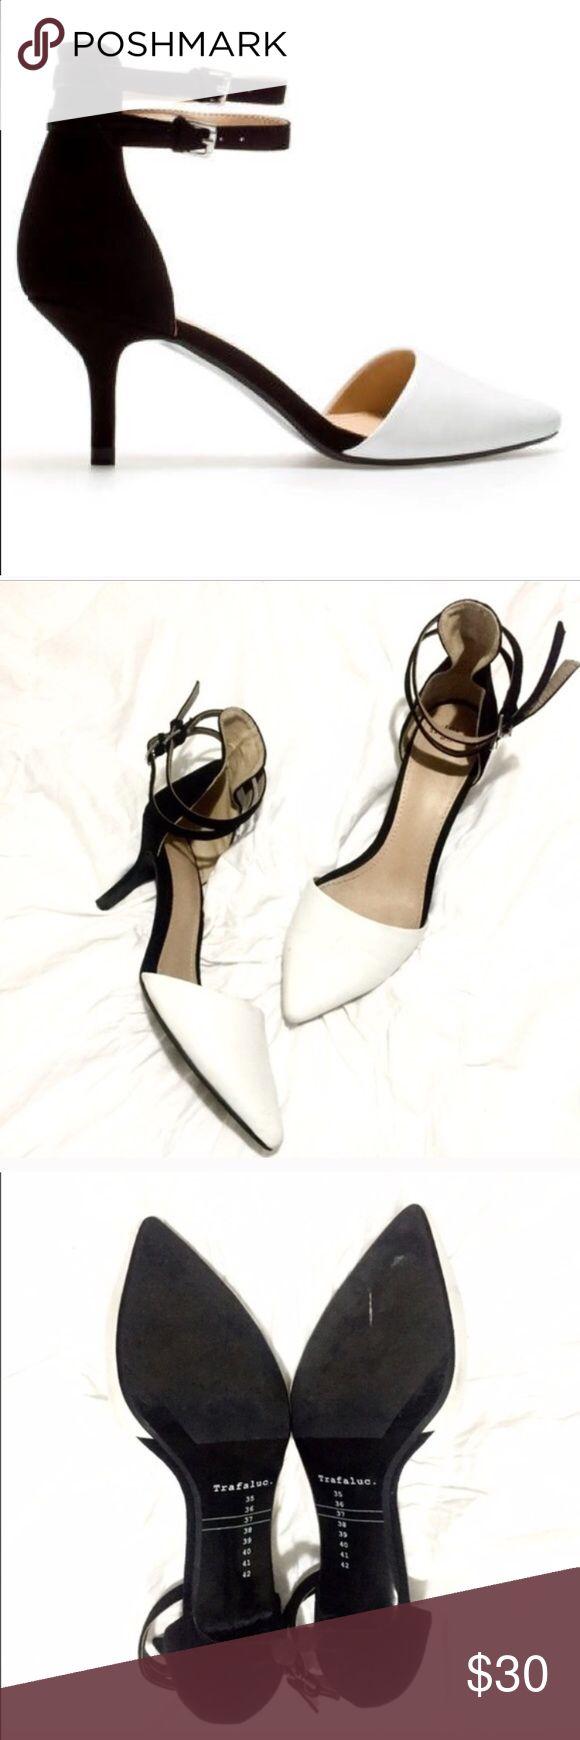 Zara two toned heels Worn twice, just minor flaws. Great condition kitten heel, black and white. Zara Shoes Heels